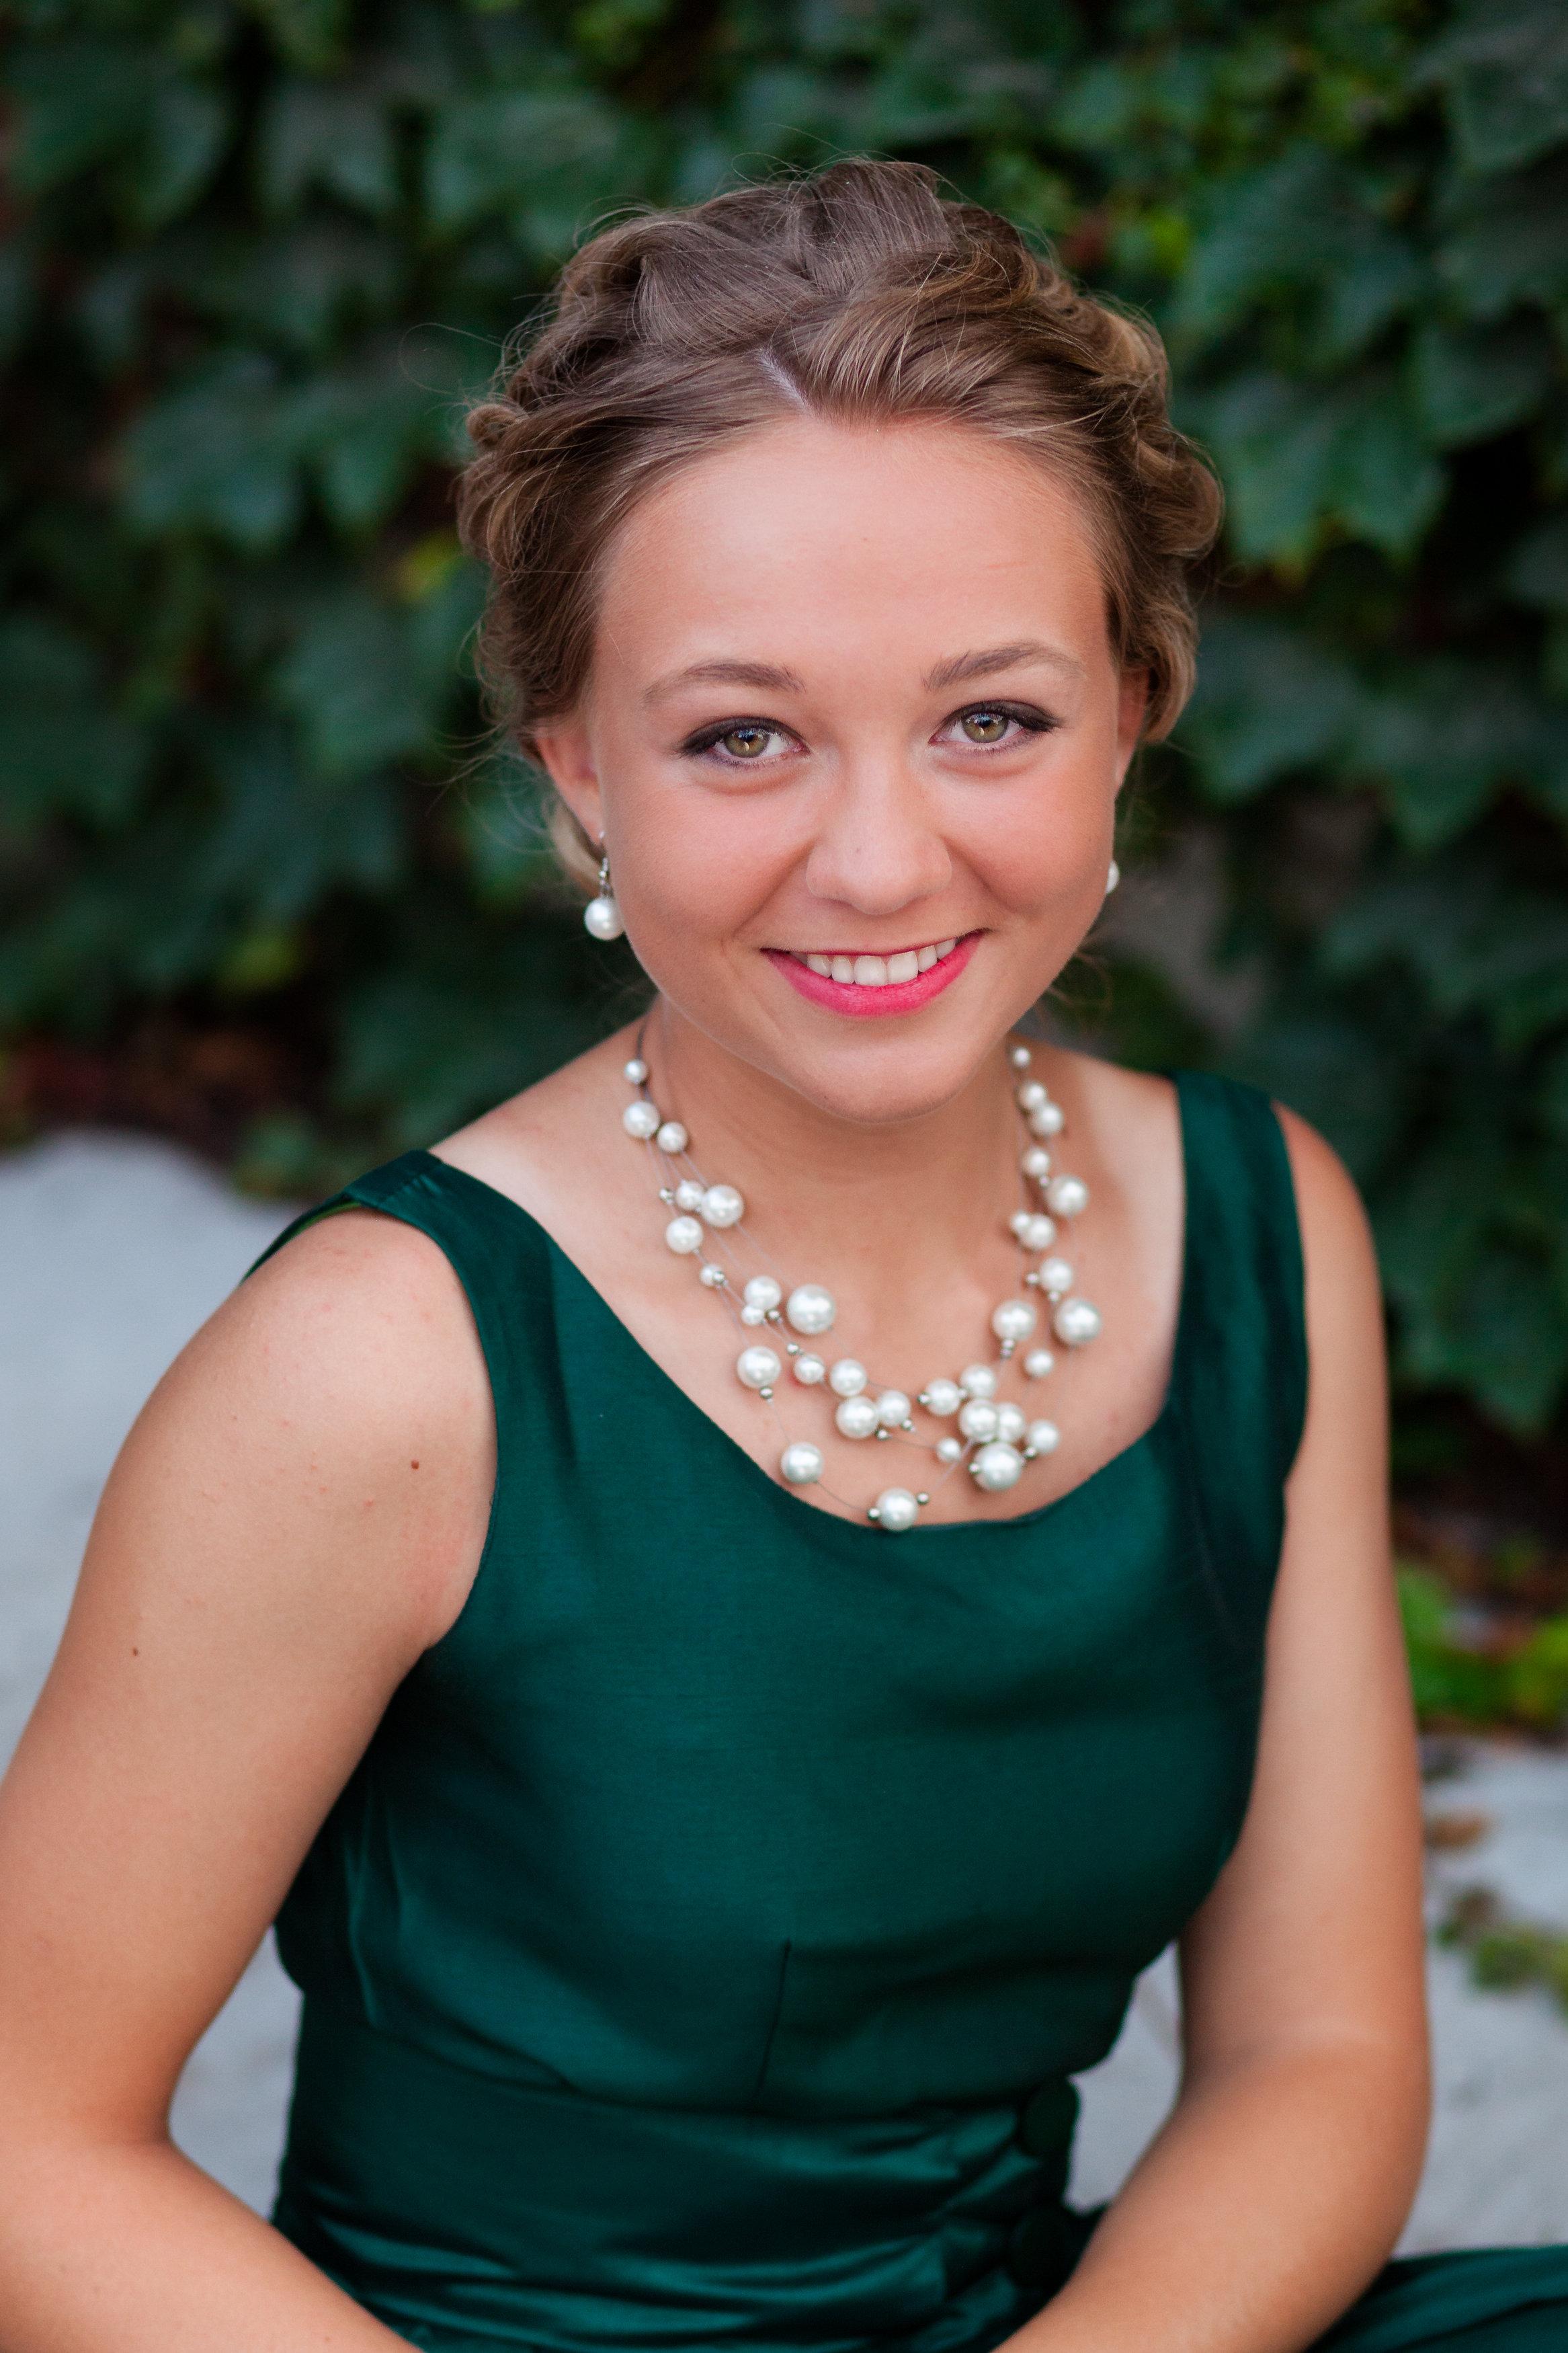 Elise Seeley 2014-Elise Seeley 2014-0077.jpg